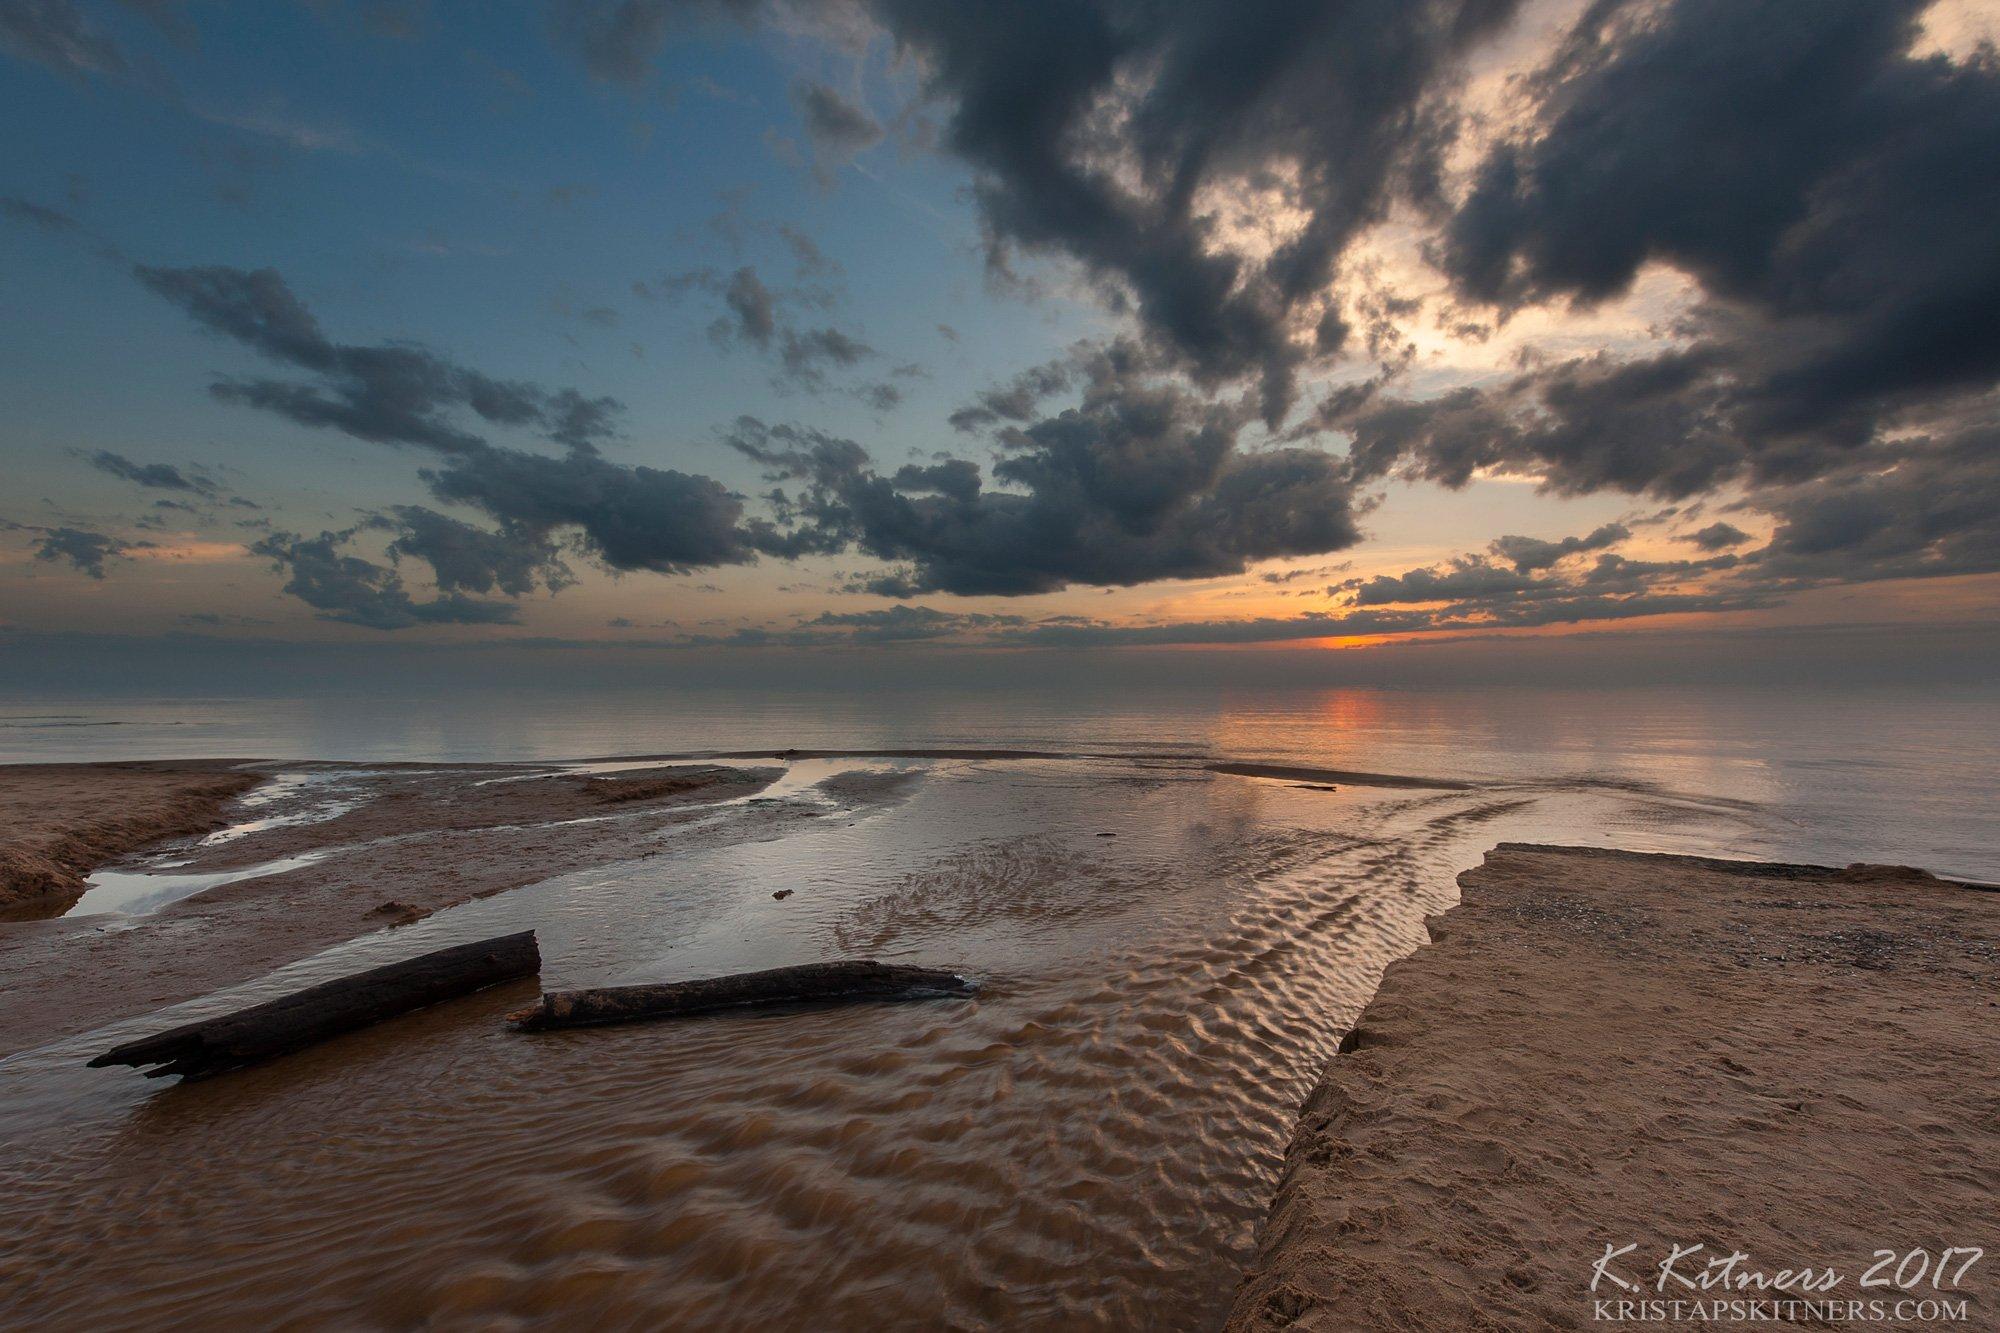 sea seascape river water sky clouds branch coast beach sand sunset evening latvia, Kristaps Kitners